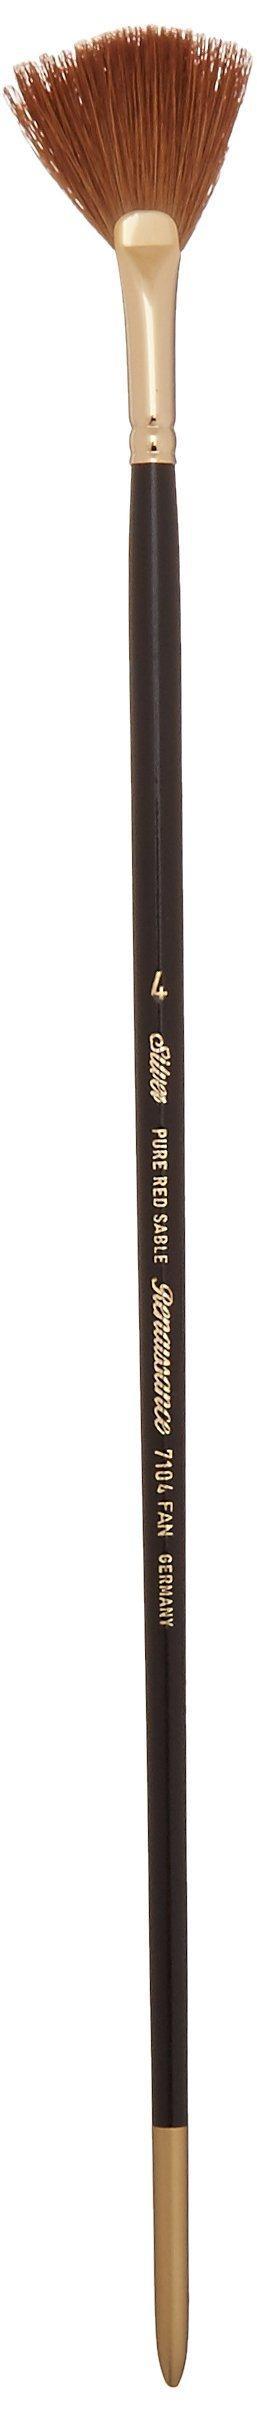 Silver Brush 7104-4 Renaissance Pure Red Sable Long Handle Premium Quality Brush, Fan Blender, Size 4